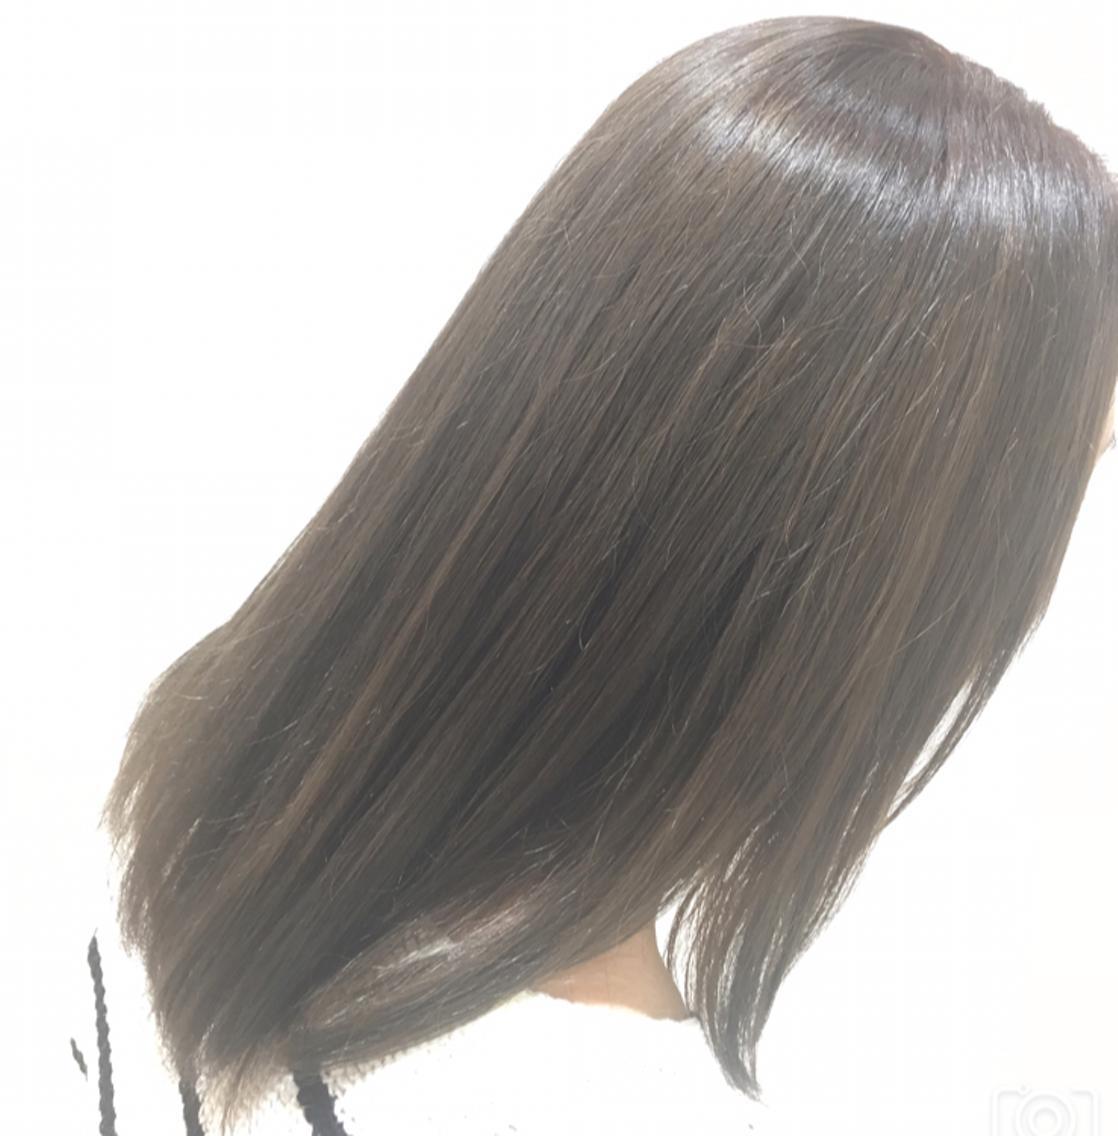 Hair Salon Blue Ocean by arose所属・小野愛歌響の掲載